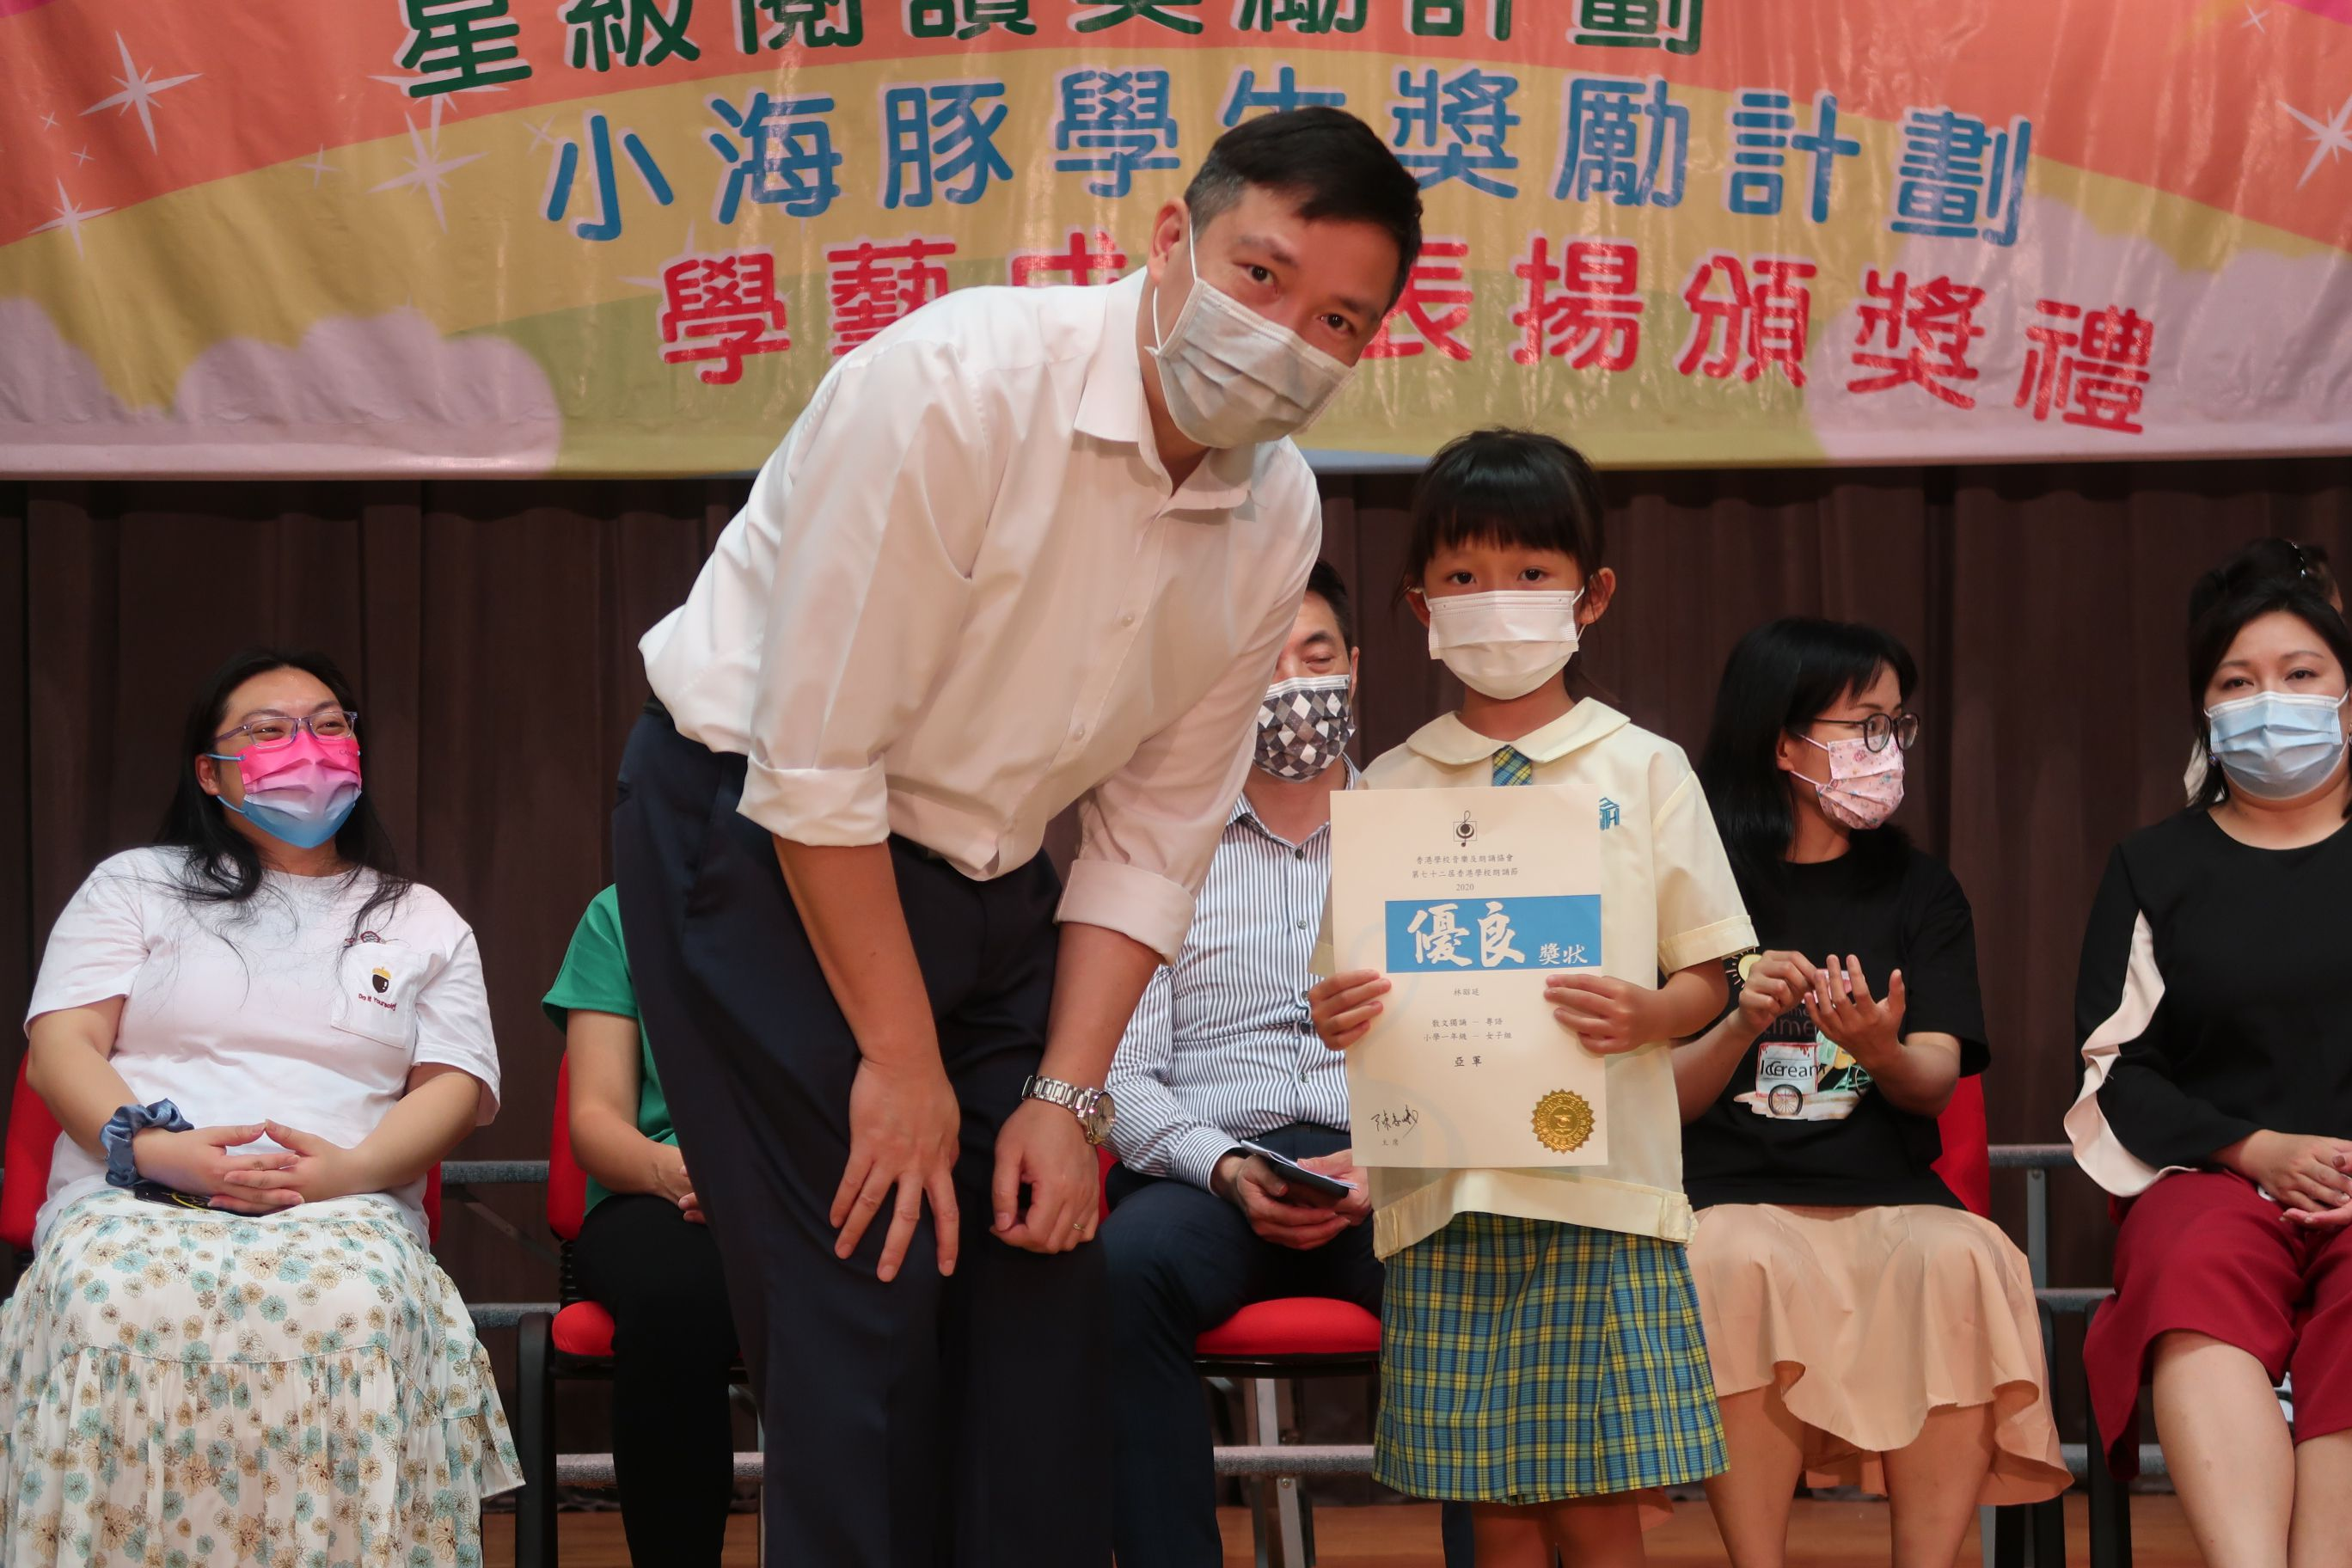 https://syh.edu.hk/sites/default/files/img_5894.jpg